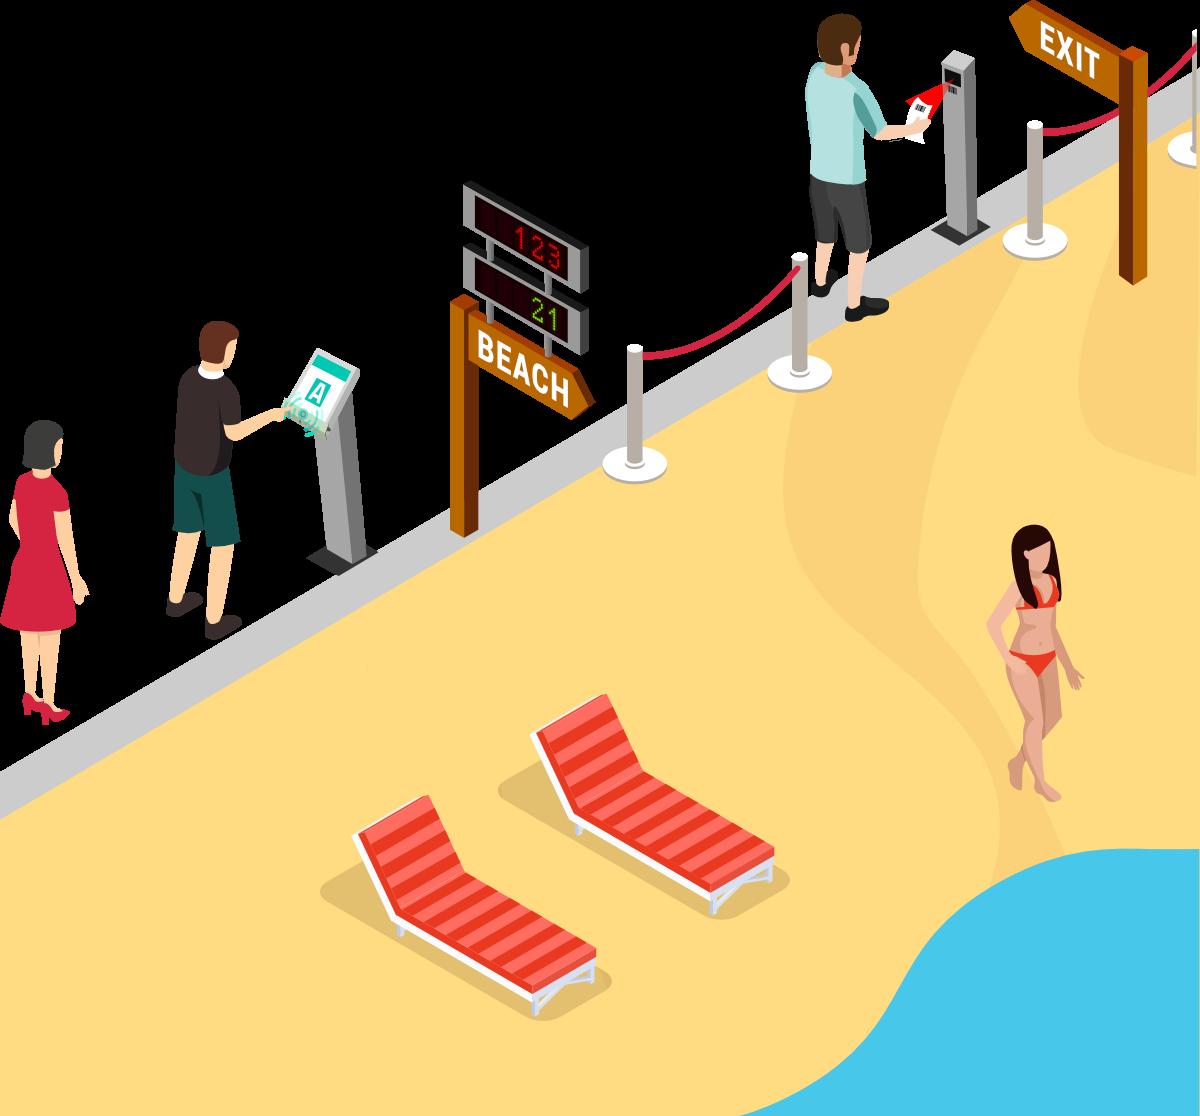 Zero Contact - Beaches